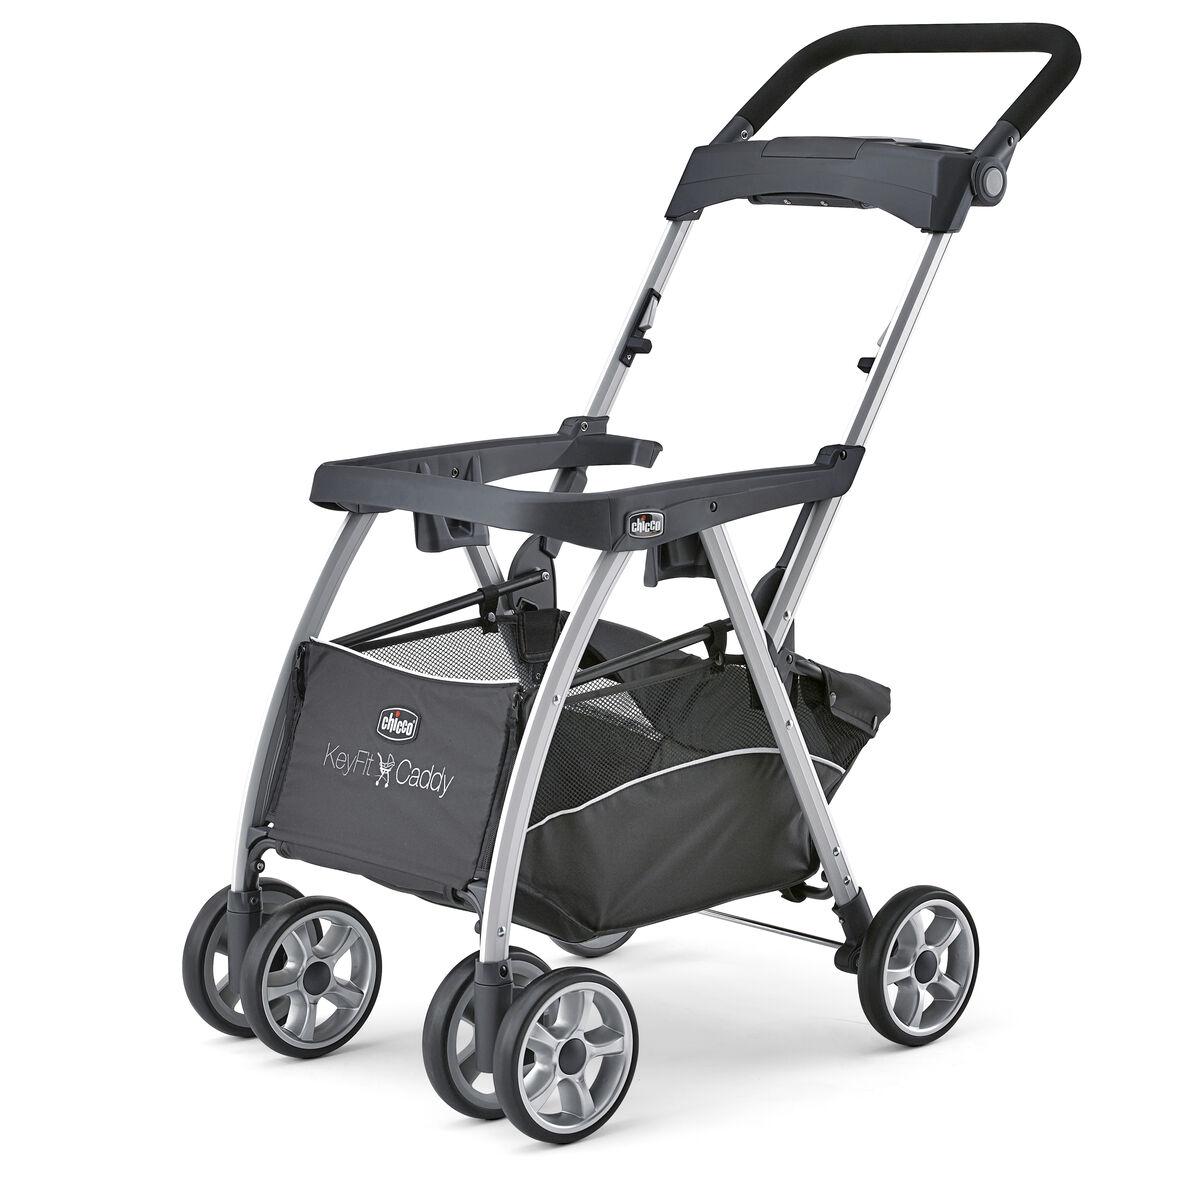 chicco keyfit caddy frame stroller -  infant car seat chicco caddy strollerkeyfit or keyfit  caddy stroller